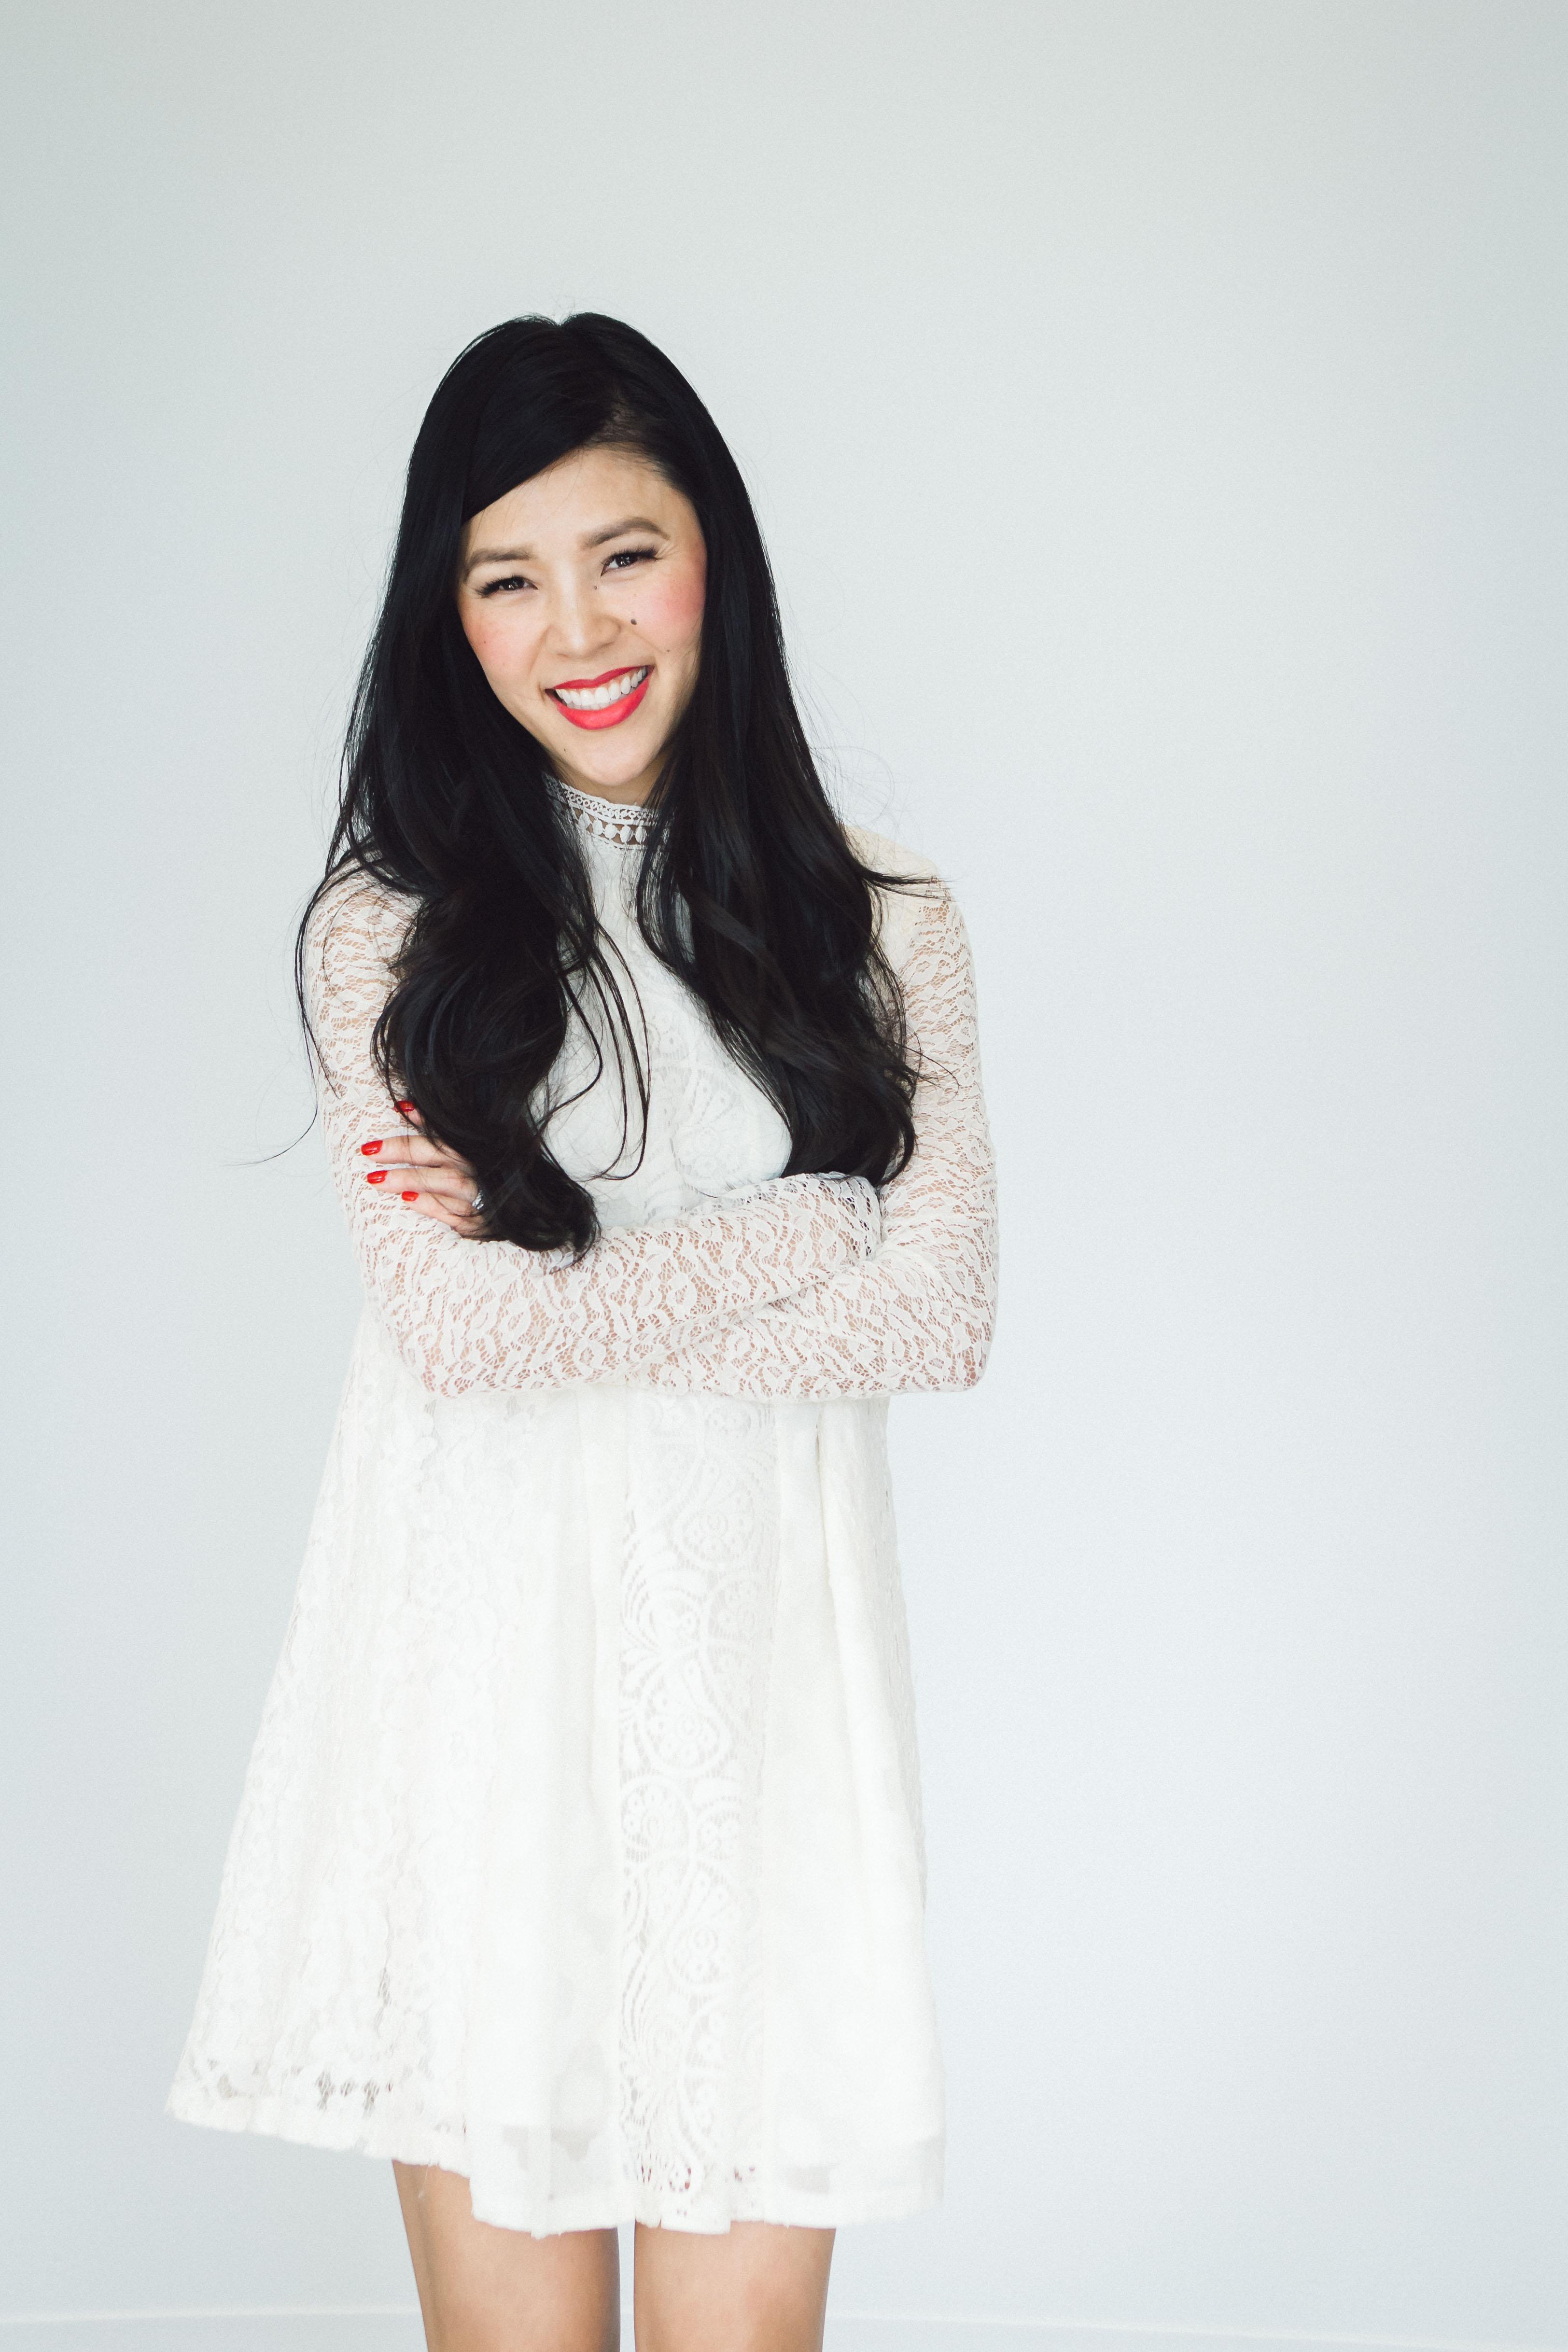 co-owner Lisa Phan